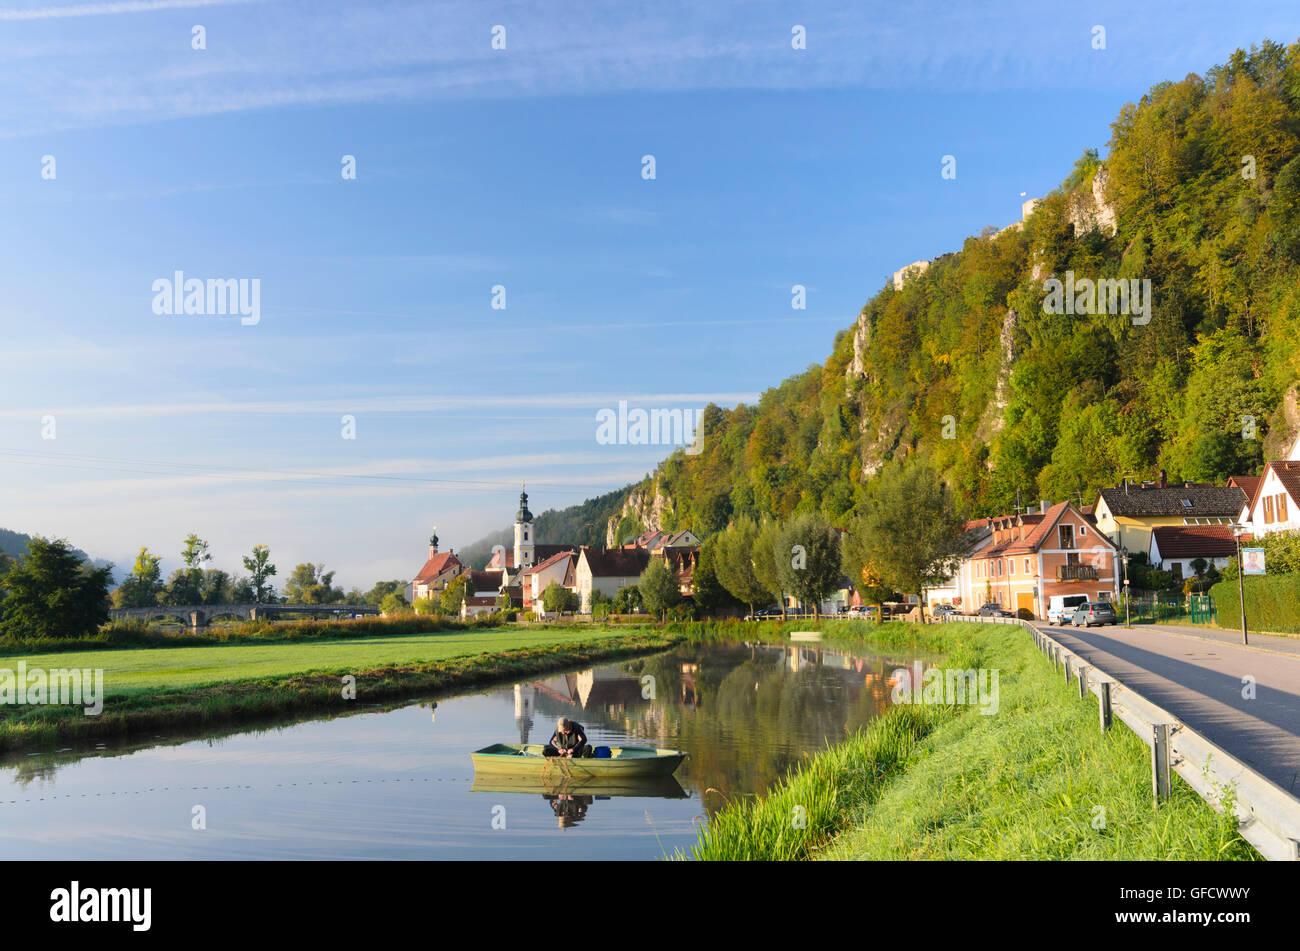 Kallmünz: river Naab , St. Michael church, castle Kallmünz, fisher, Germany, Bayern, Bavaria, Oberpfalz, - Stock Image